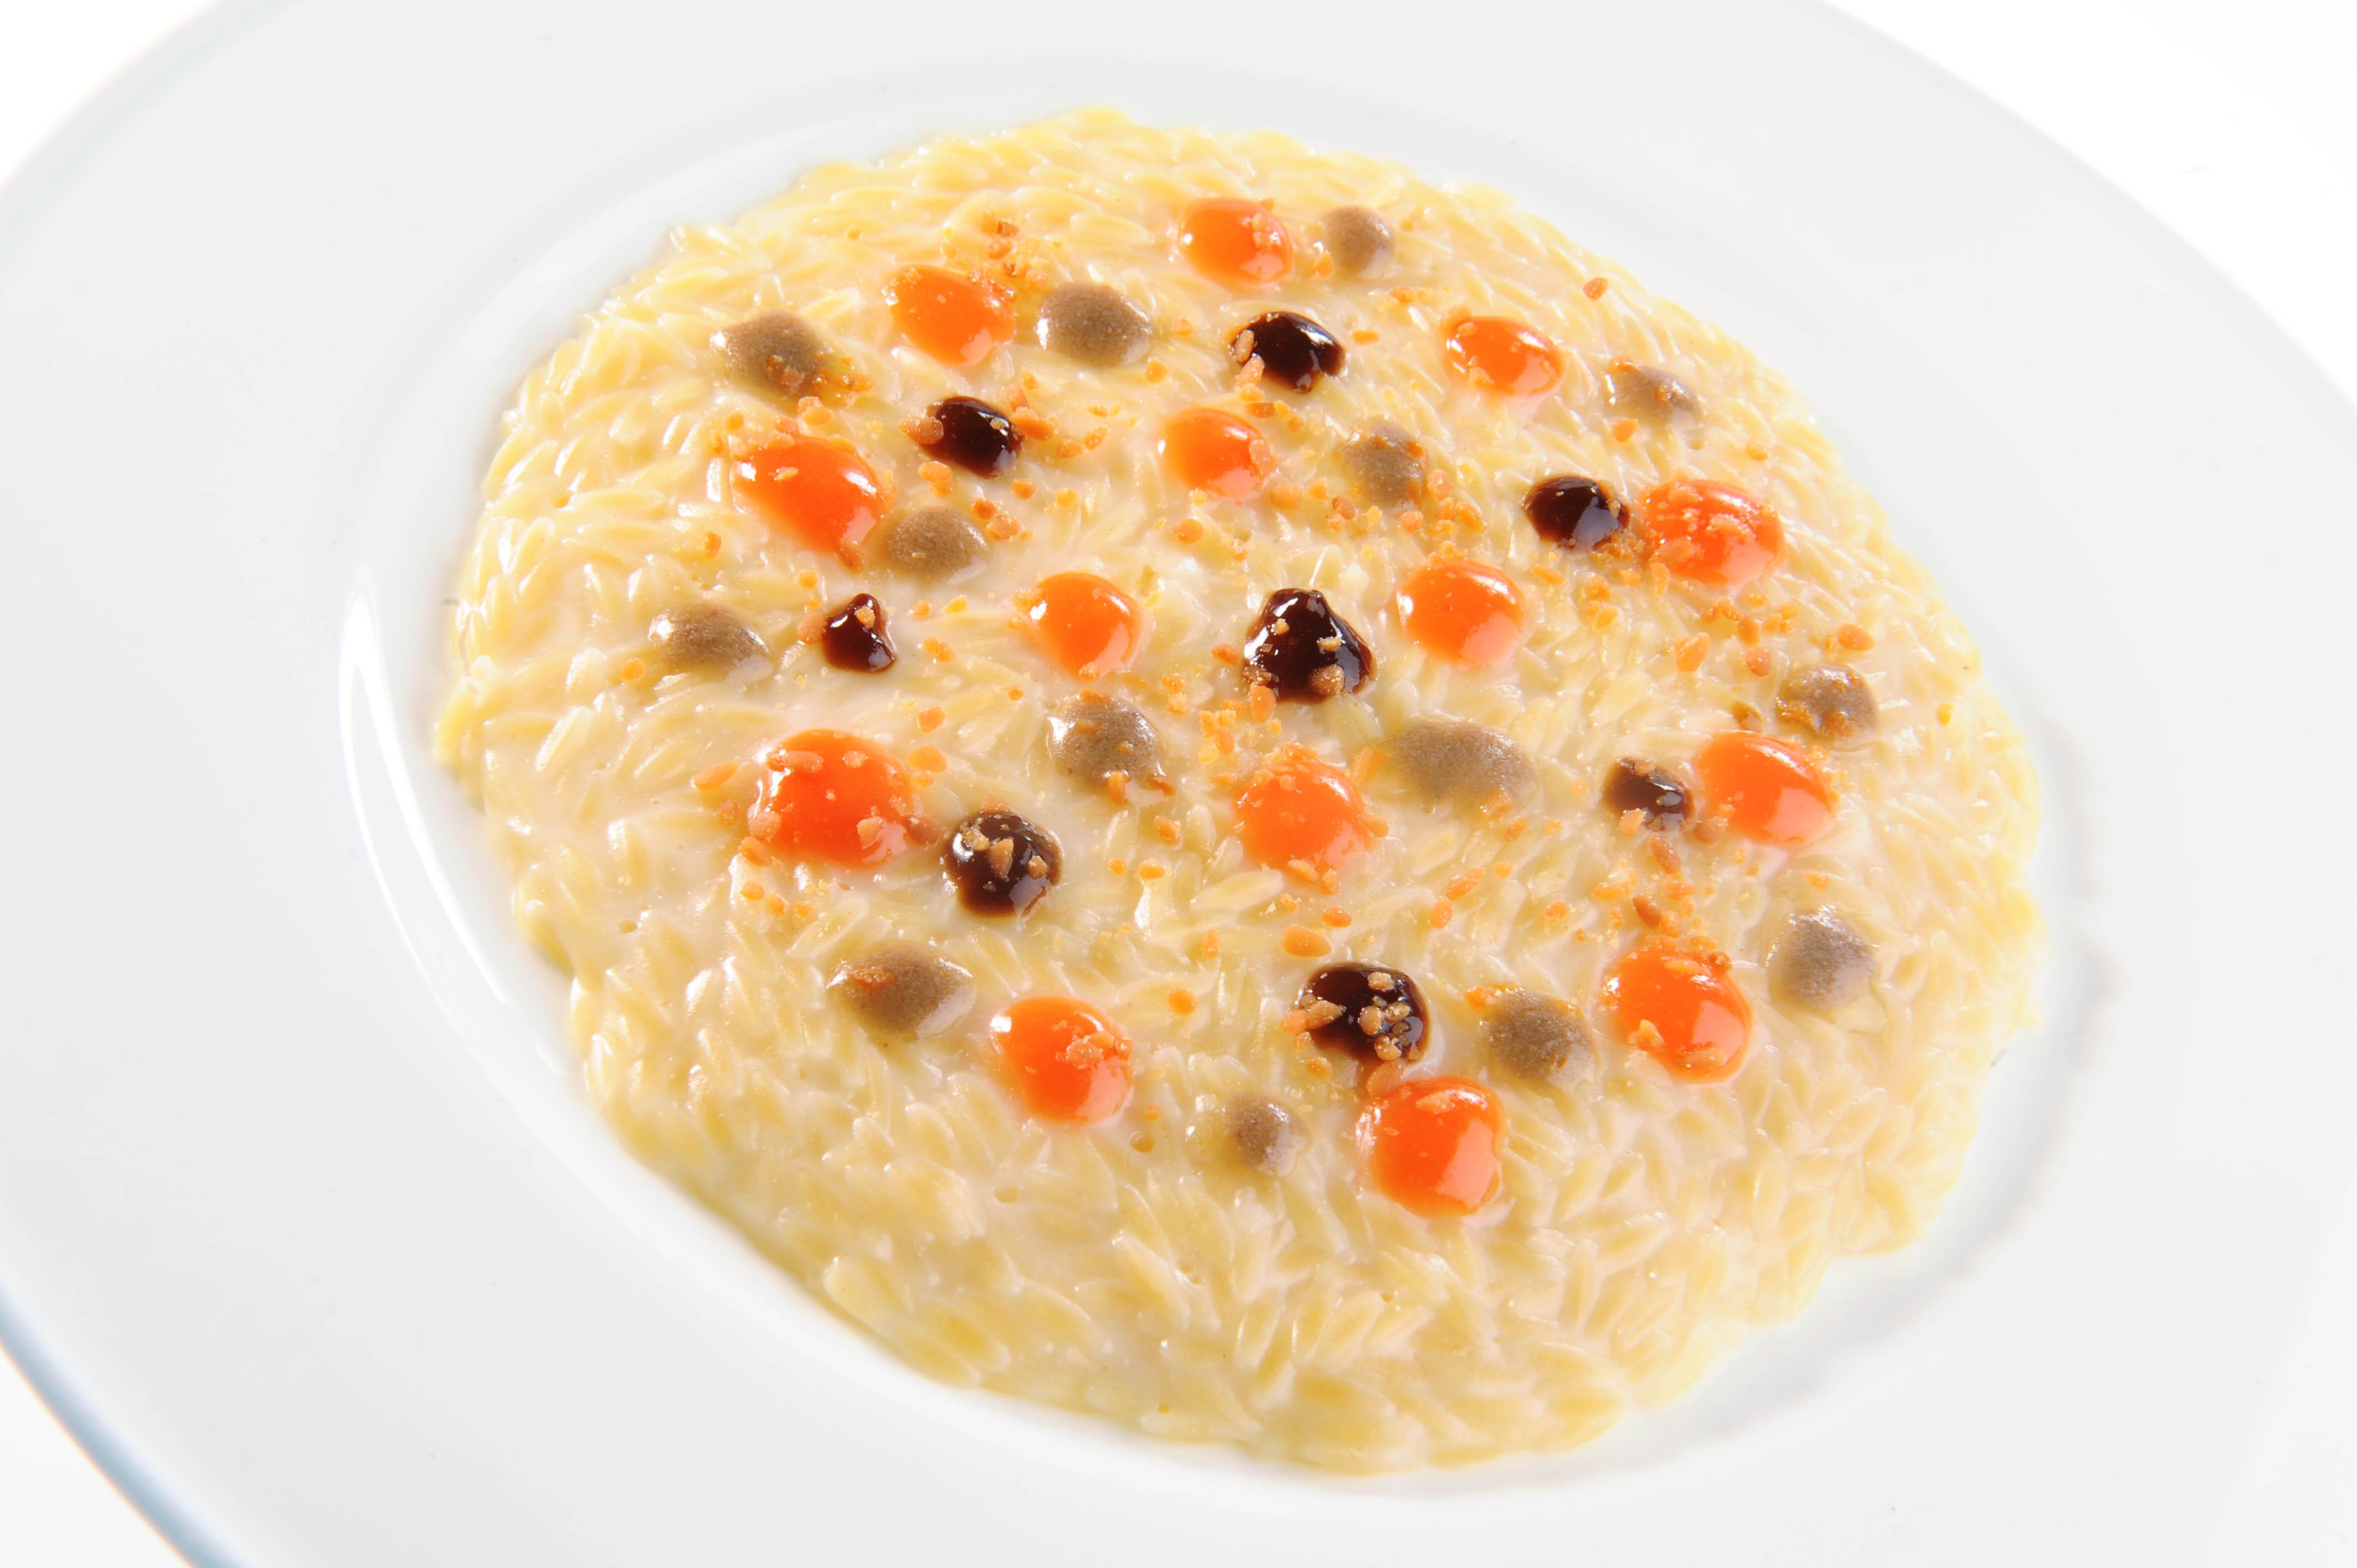 Acciughe caffe amaro arancia e pasta mantecata